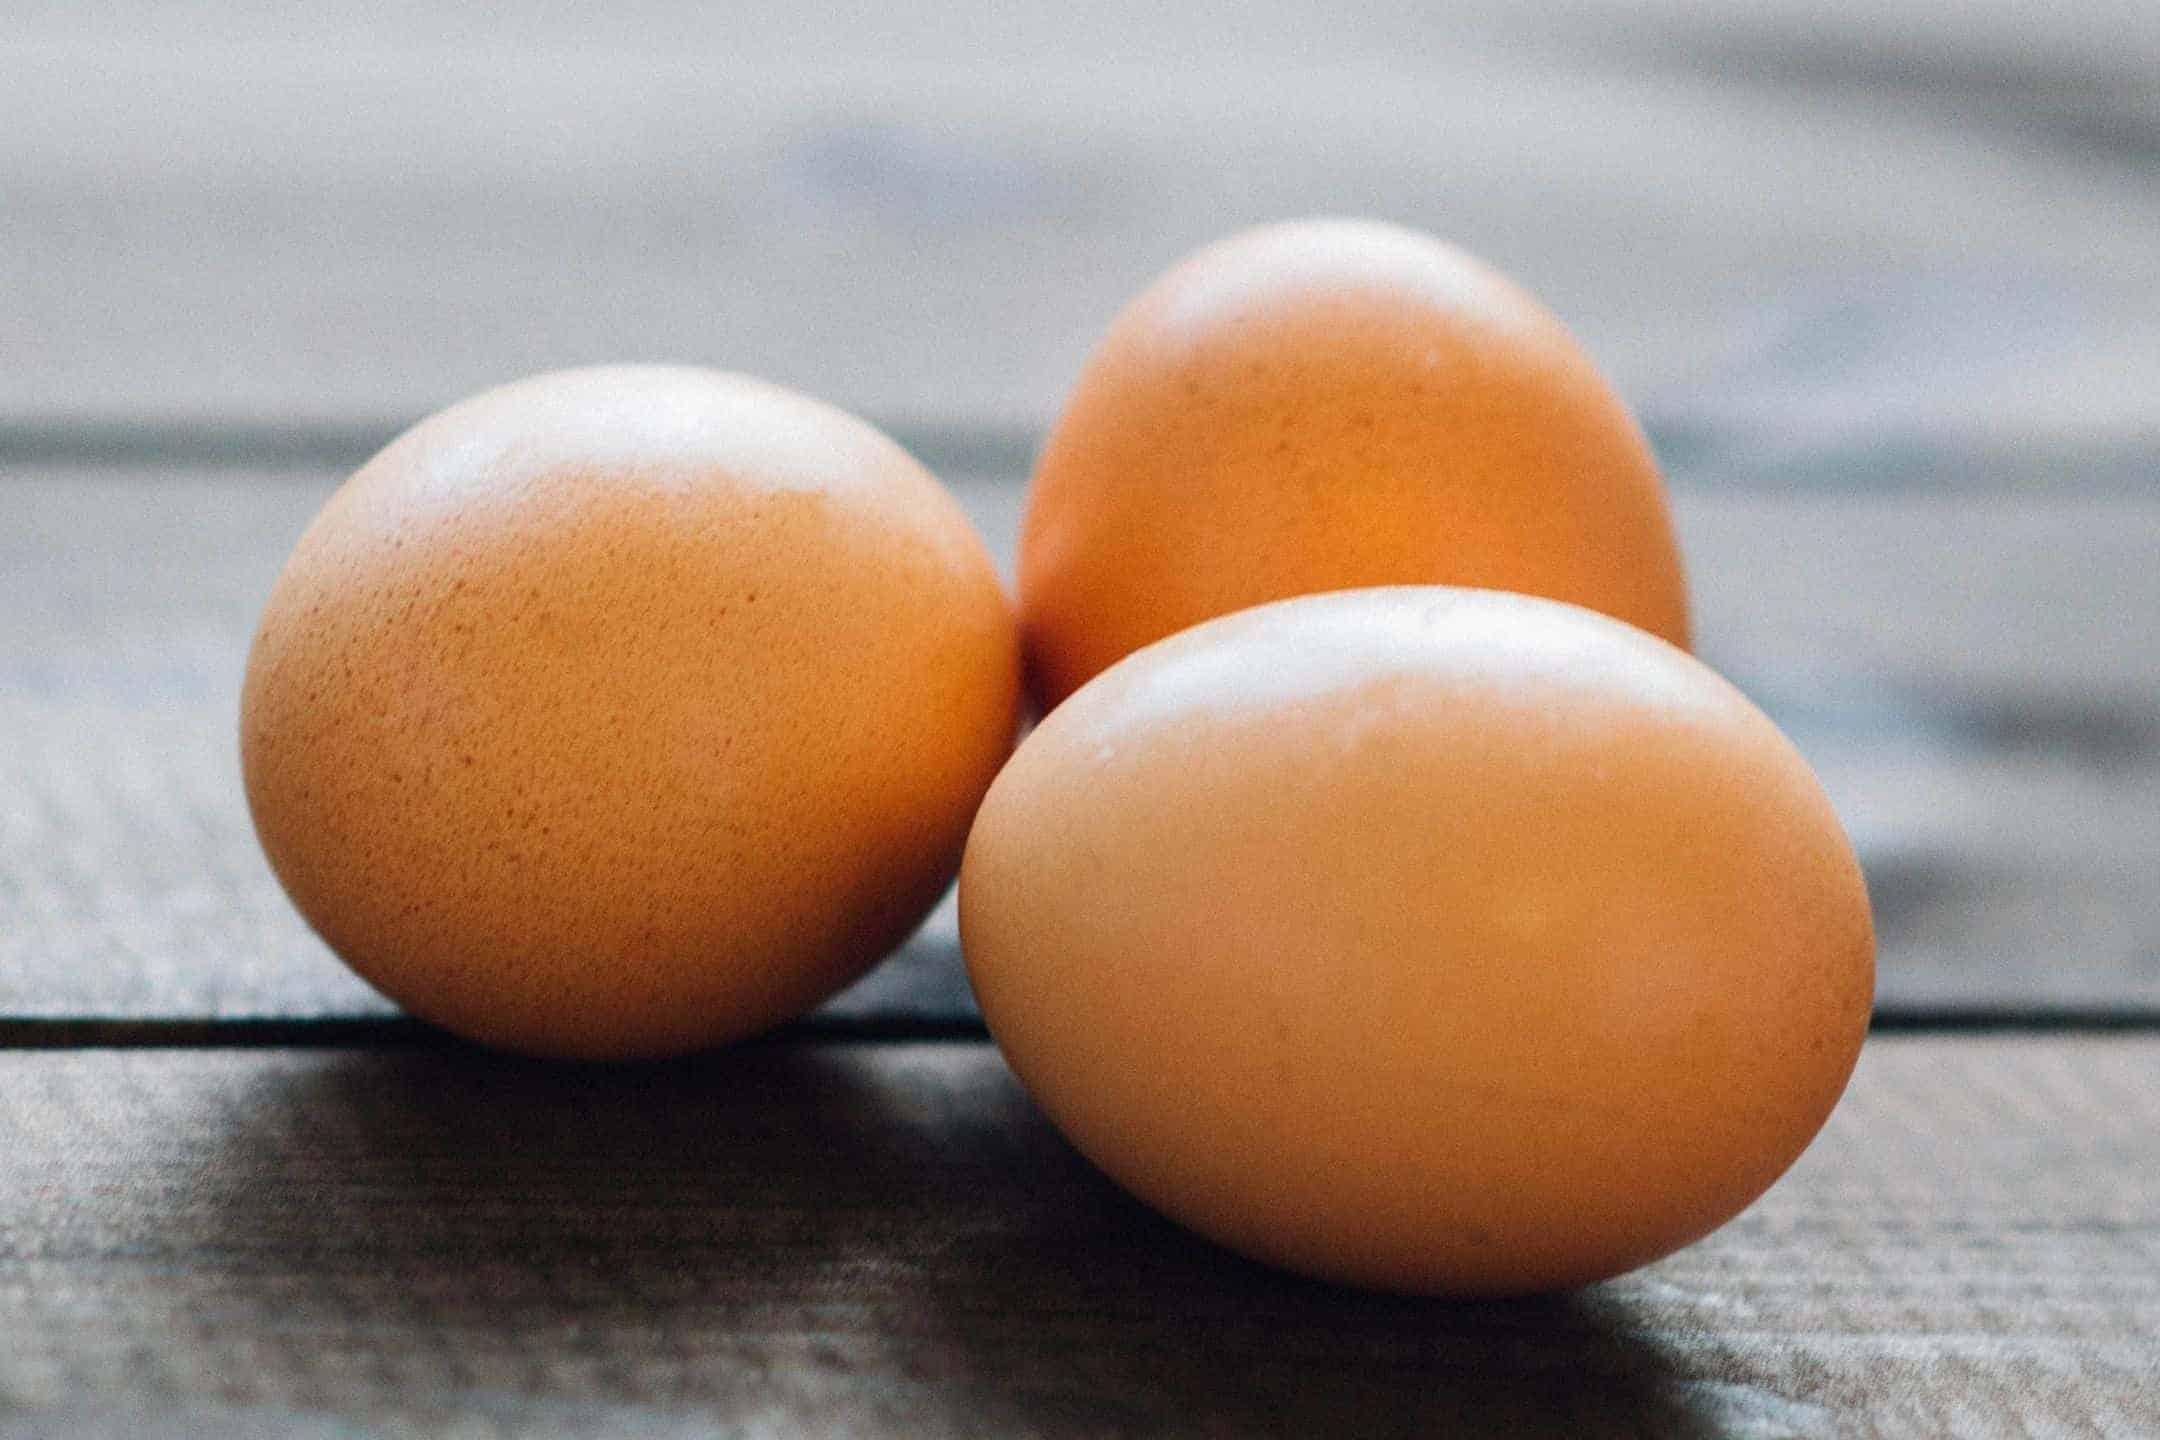 Three Farm fresh brown eggs on a picnic table